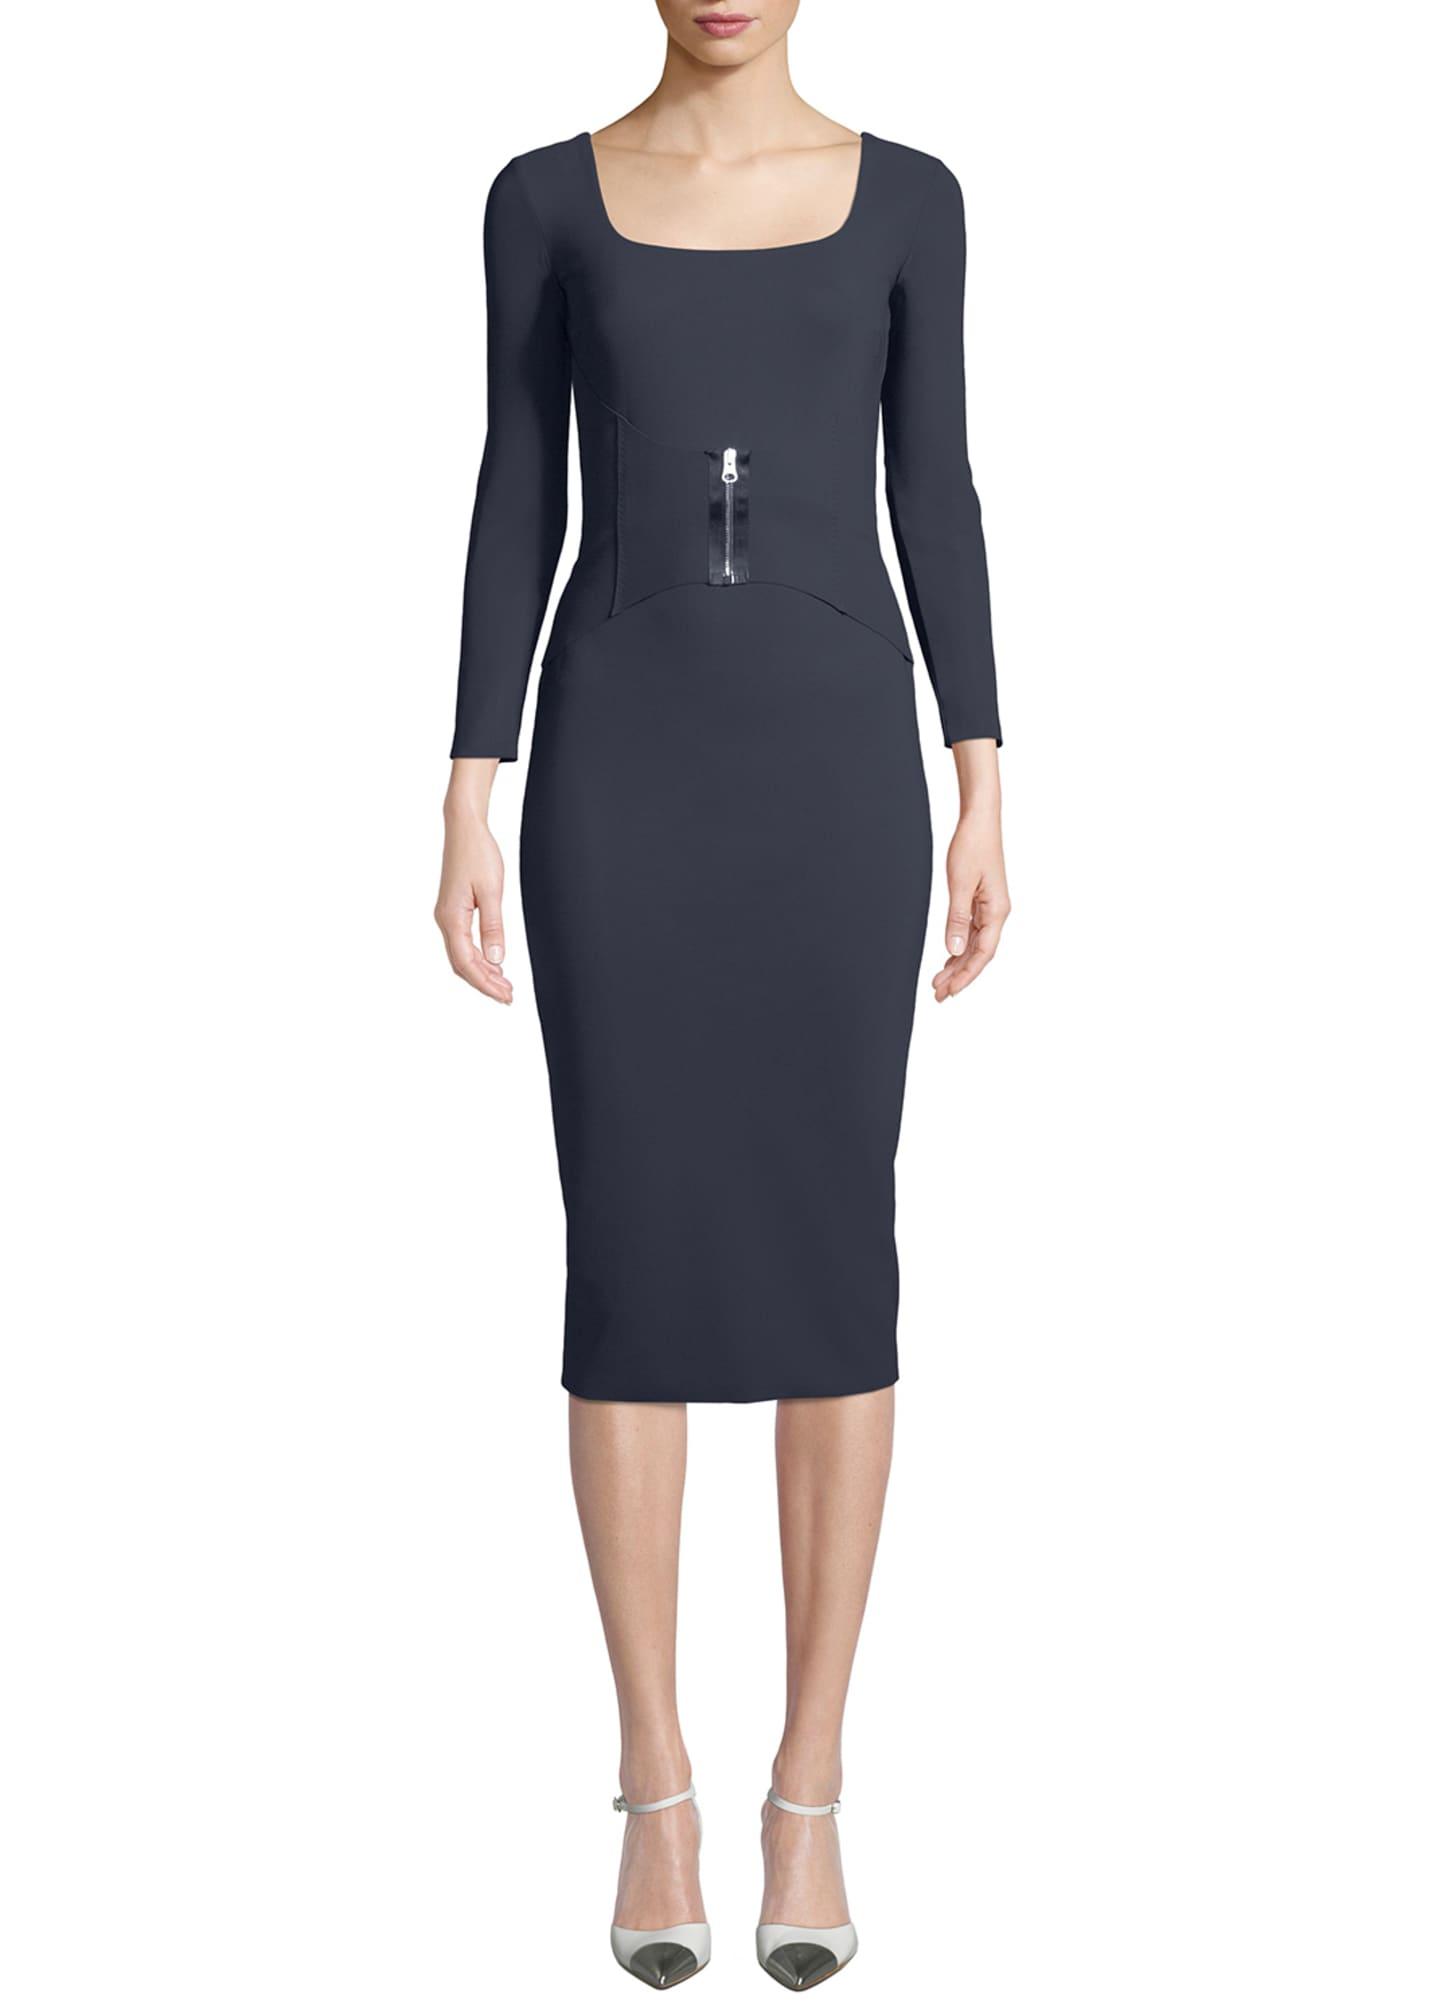 Chiara Boni La Petite Robe Humette Midi Dress